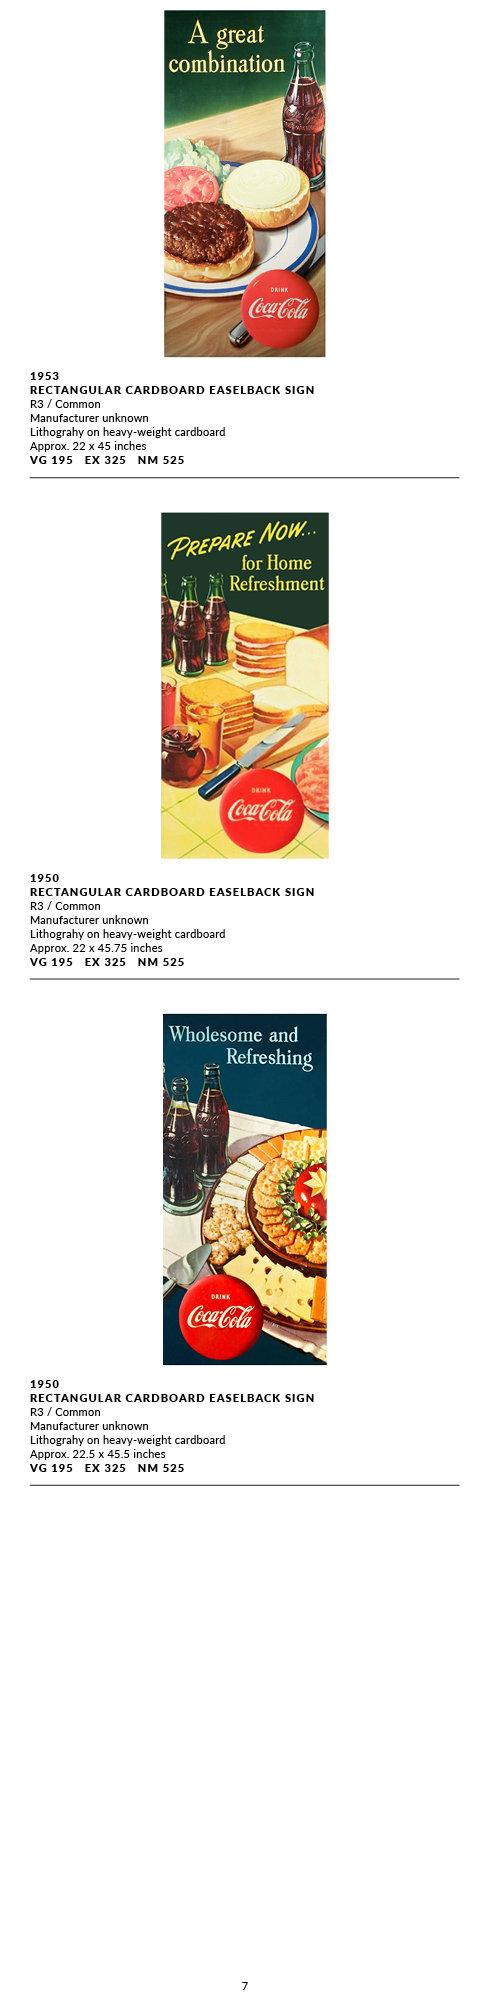 2018_1940-1969RectCardboards7.jpg